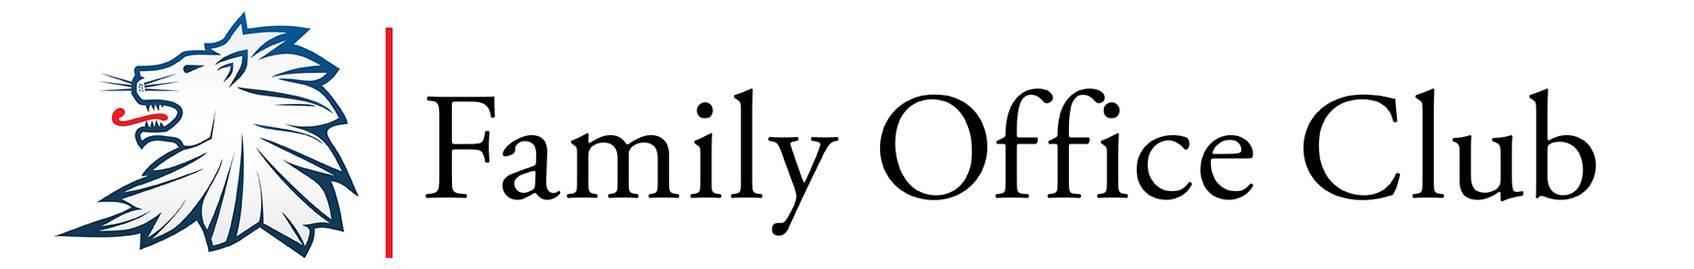 family office club logo